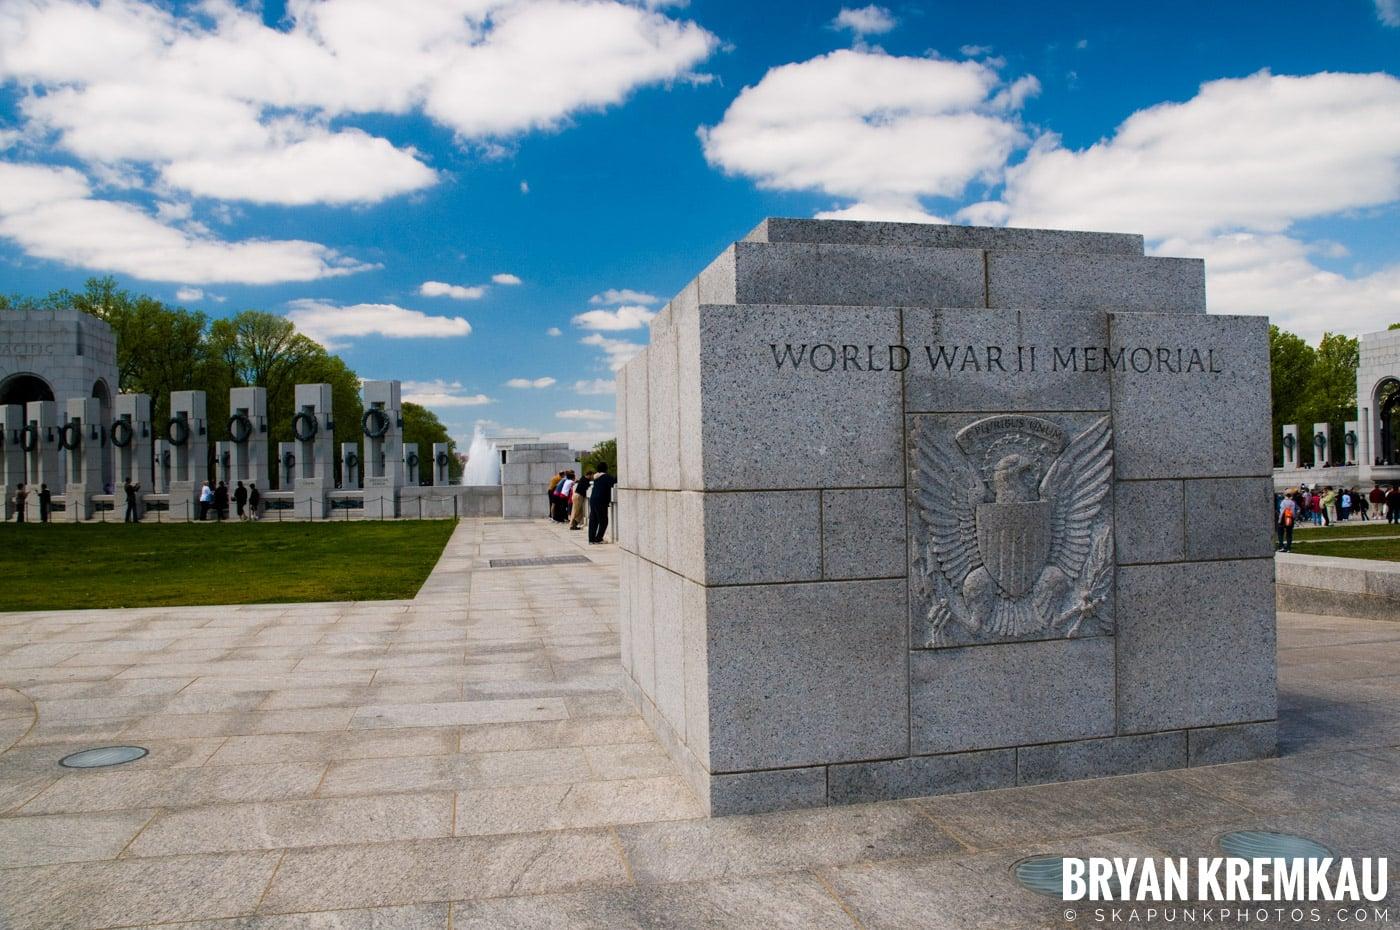 Washington, DC Trip - Day 2 - 4.9.10 (17)